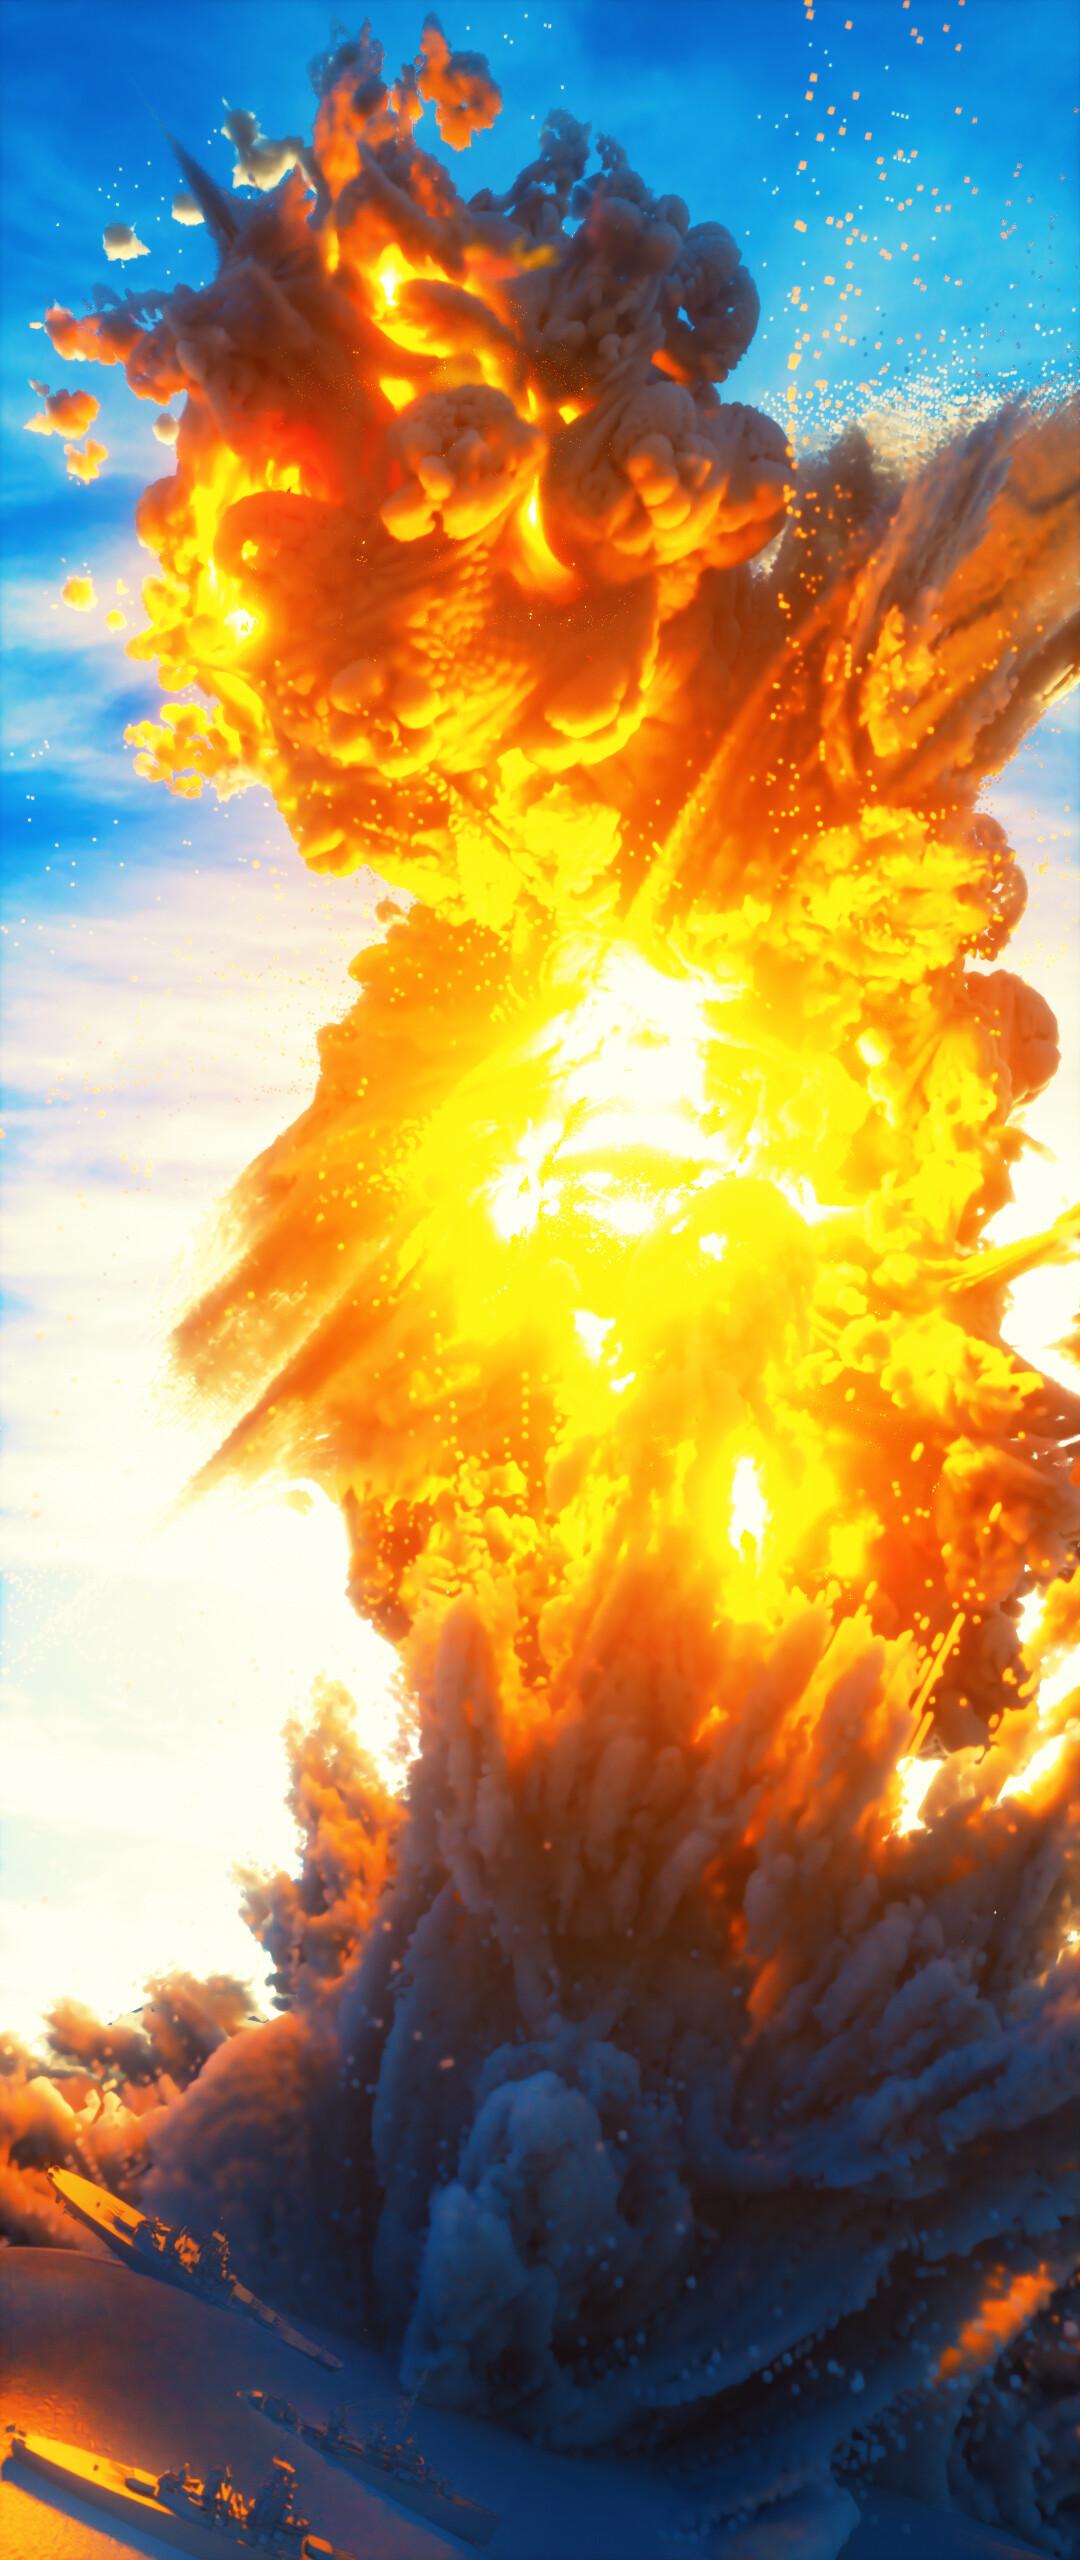 Ben nicholas bennicholas kom44 anomaly greatbombardment 03